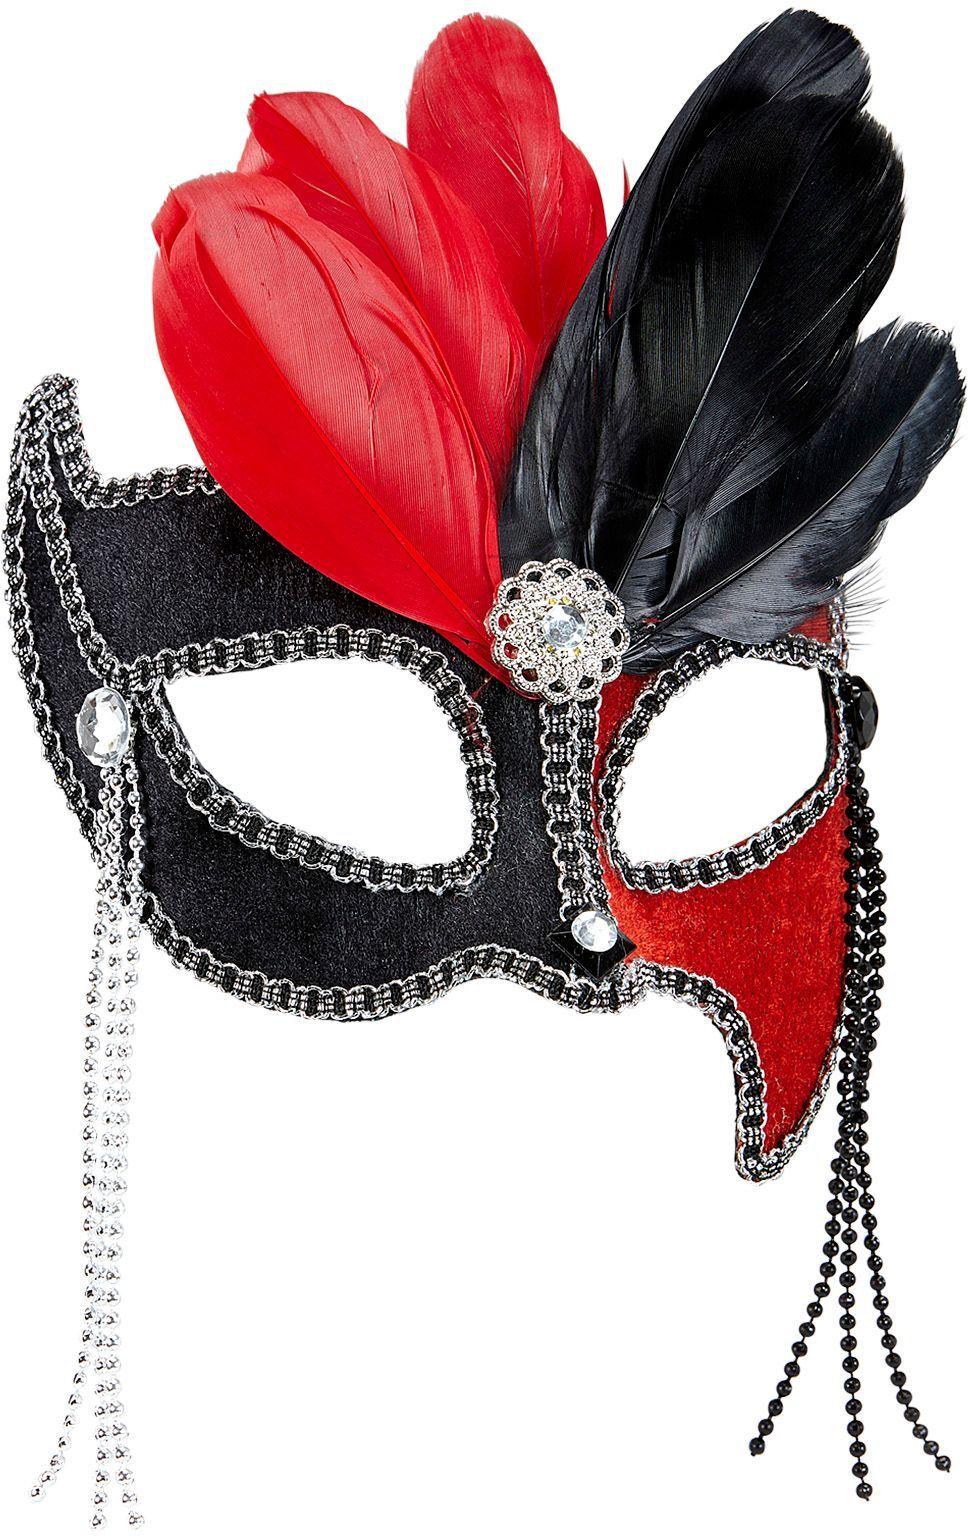 Gala oogmasker zwart-rood